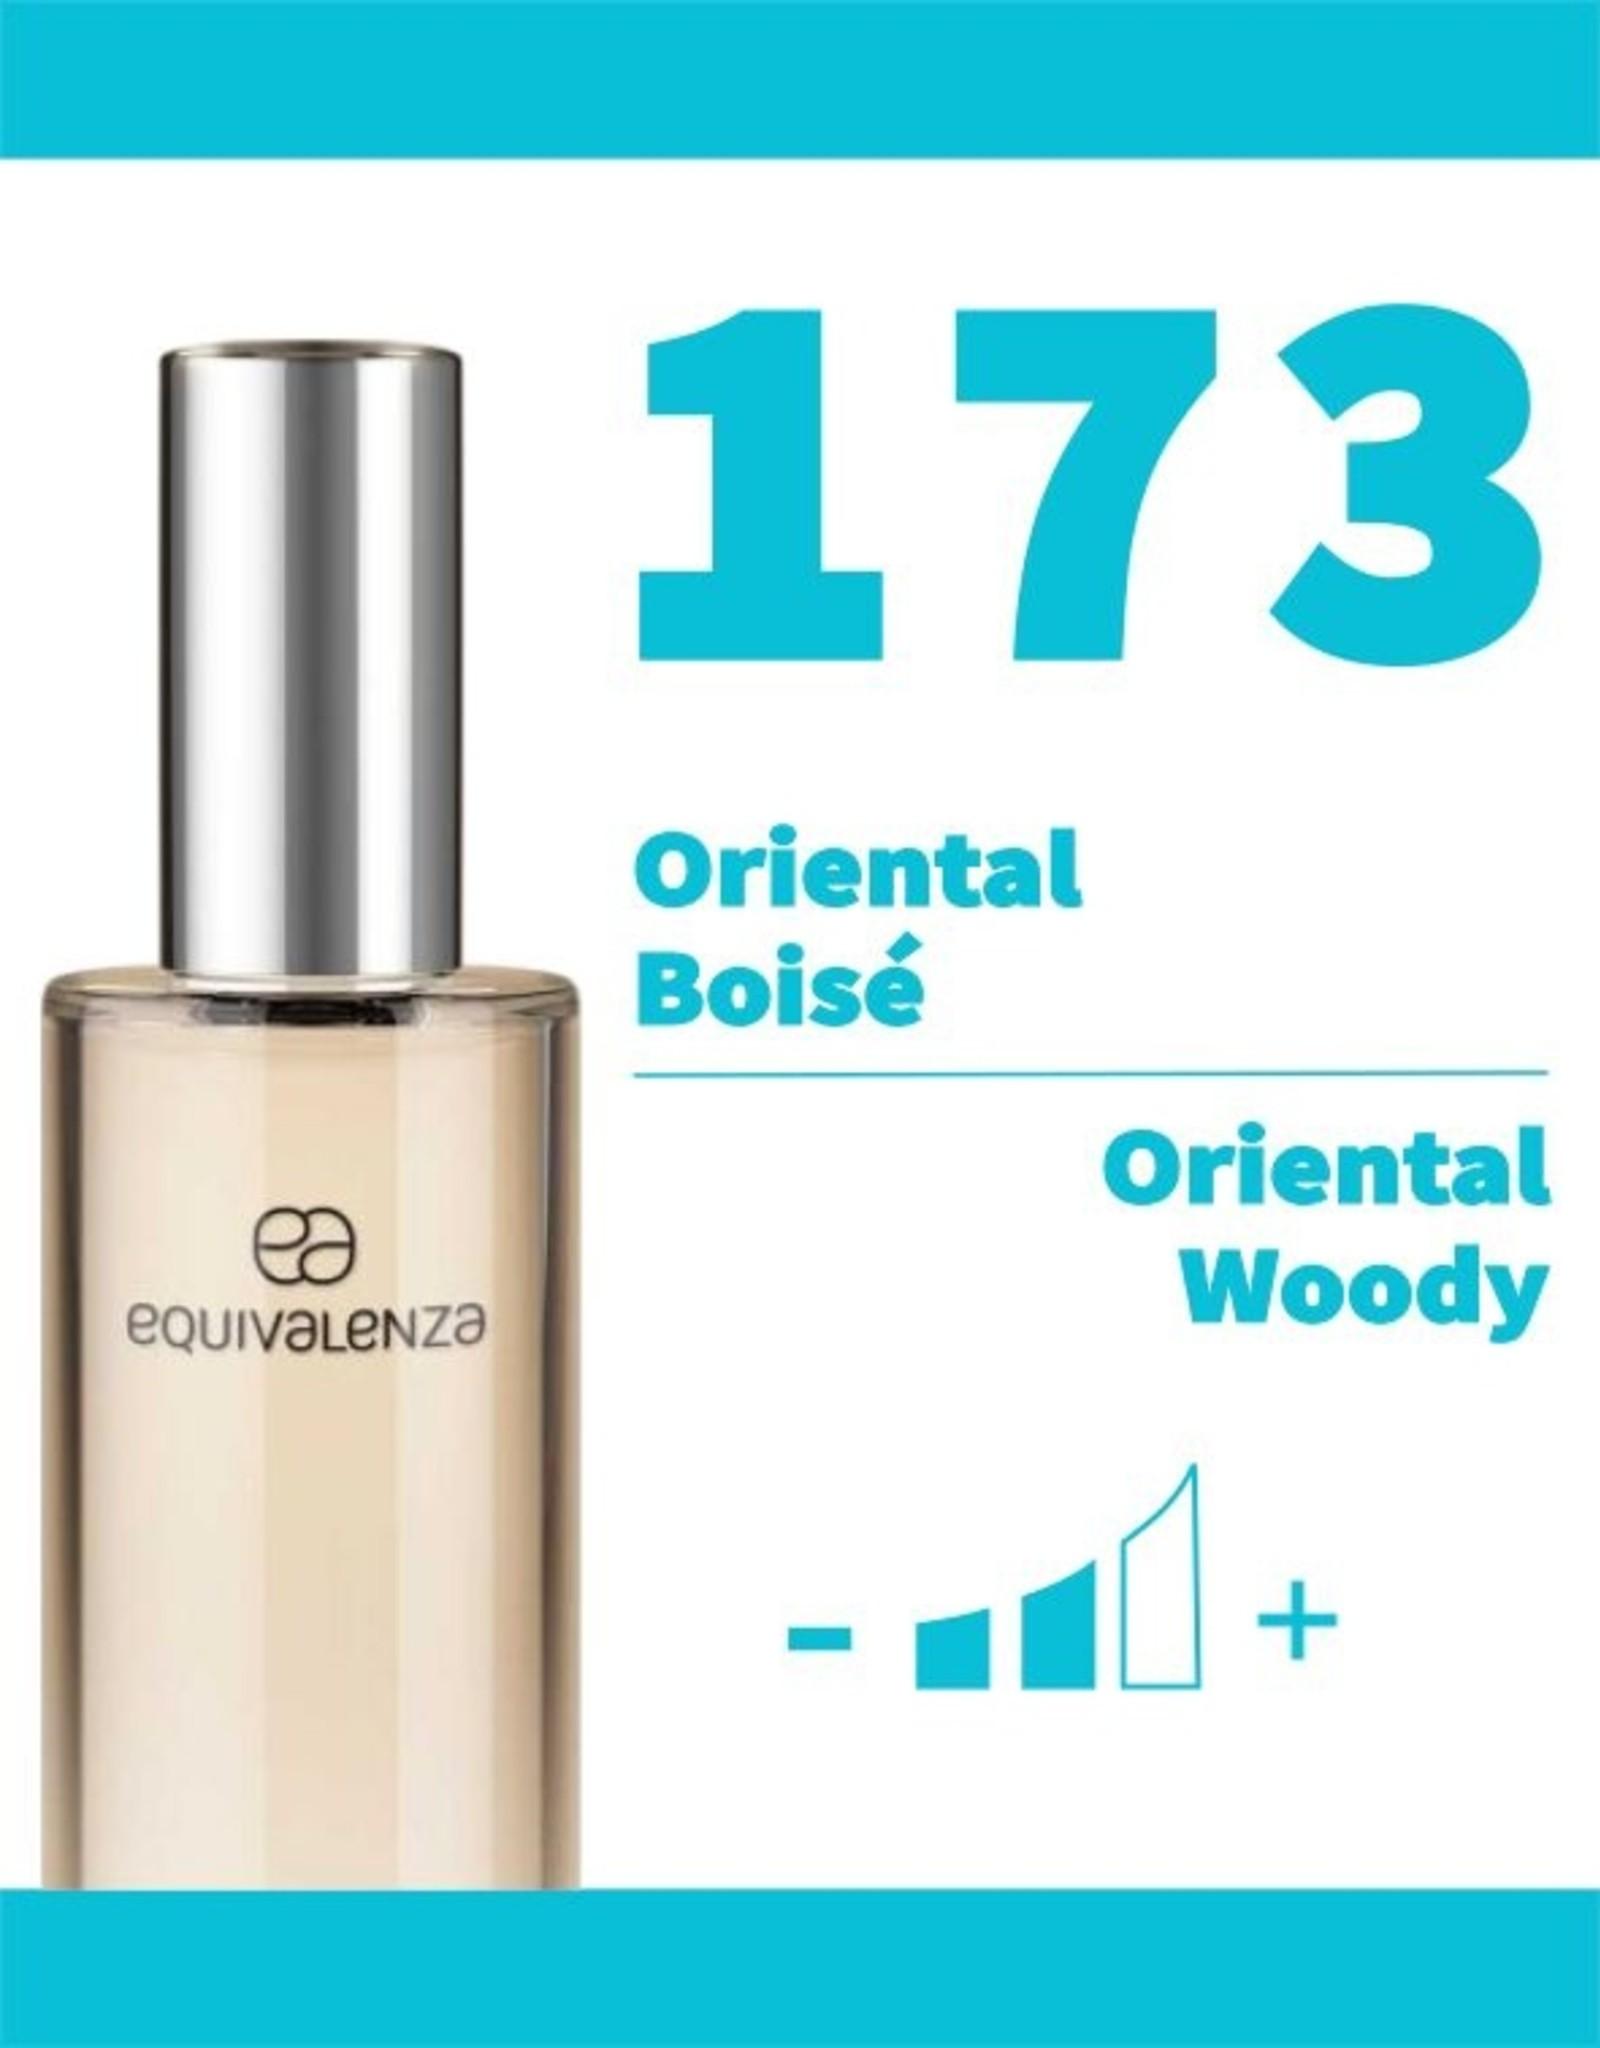 Equivalenza Eau de Toilette Oriental Woody 173